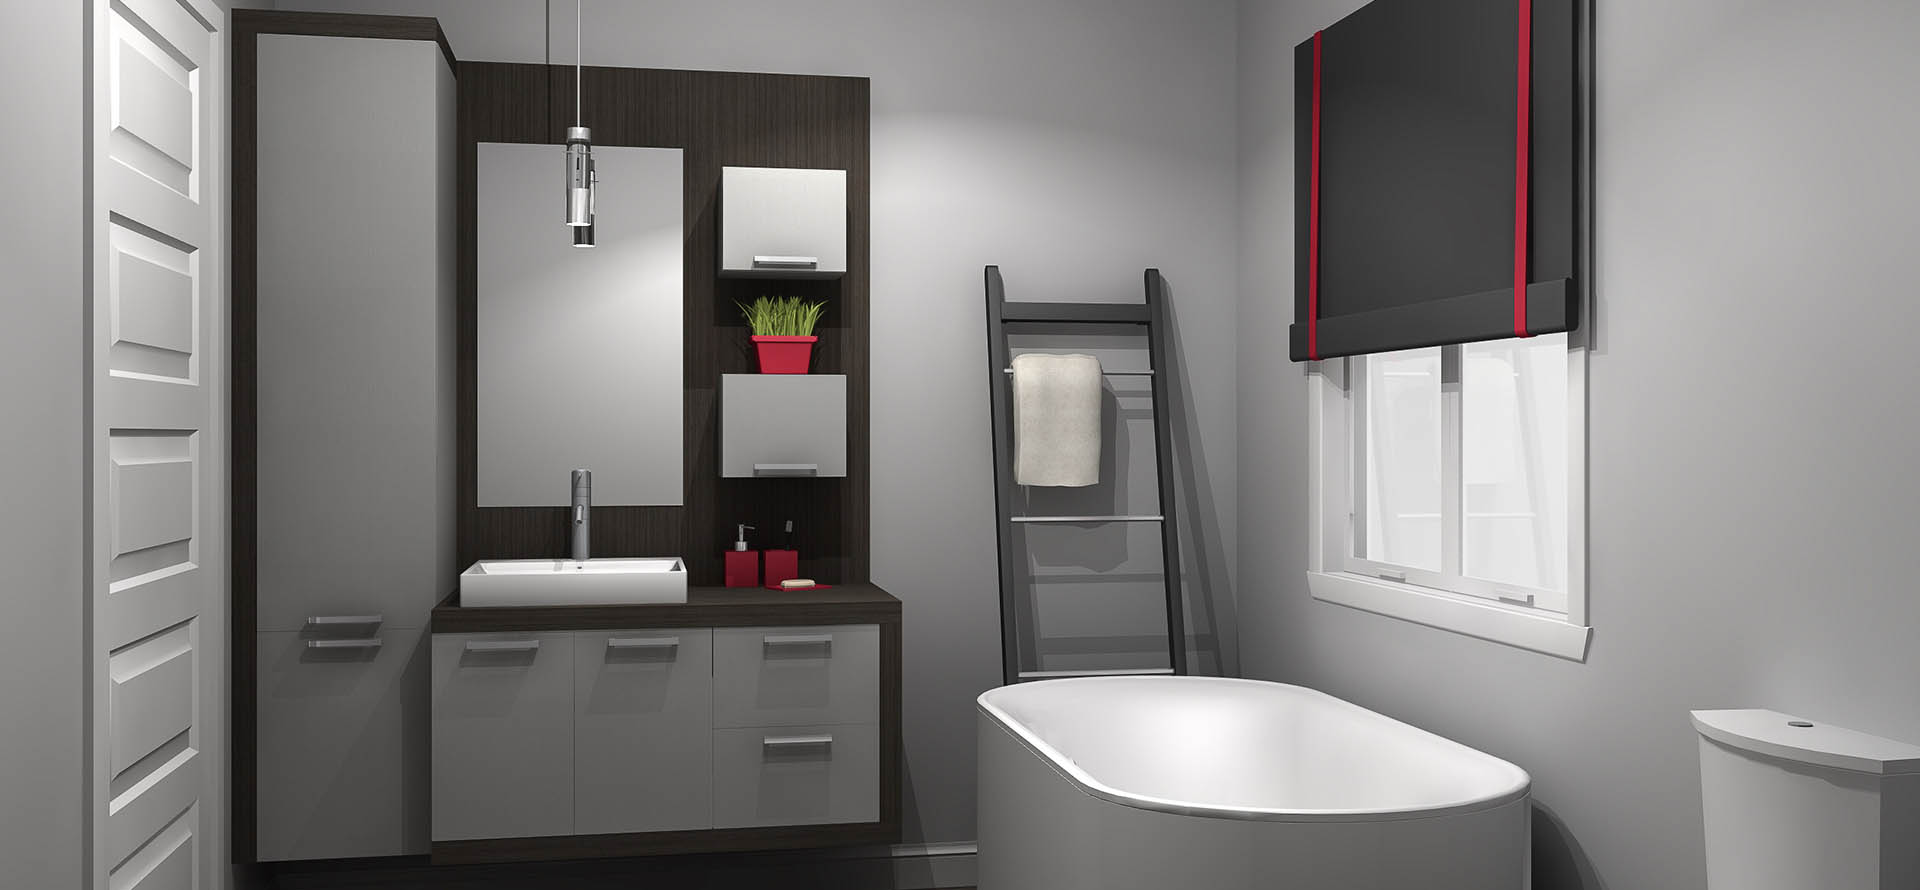 plan de cuisine en 3d. Black Bedroom Furniture Sets. Home Design Ideas